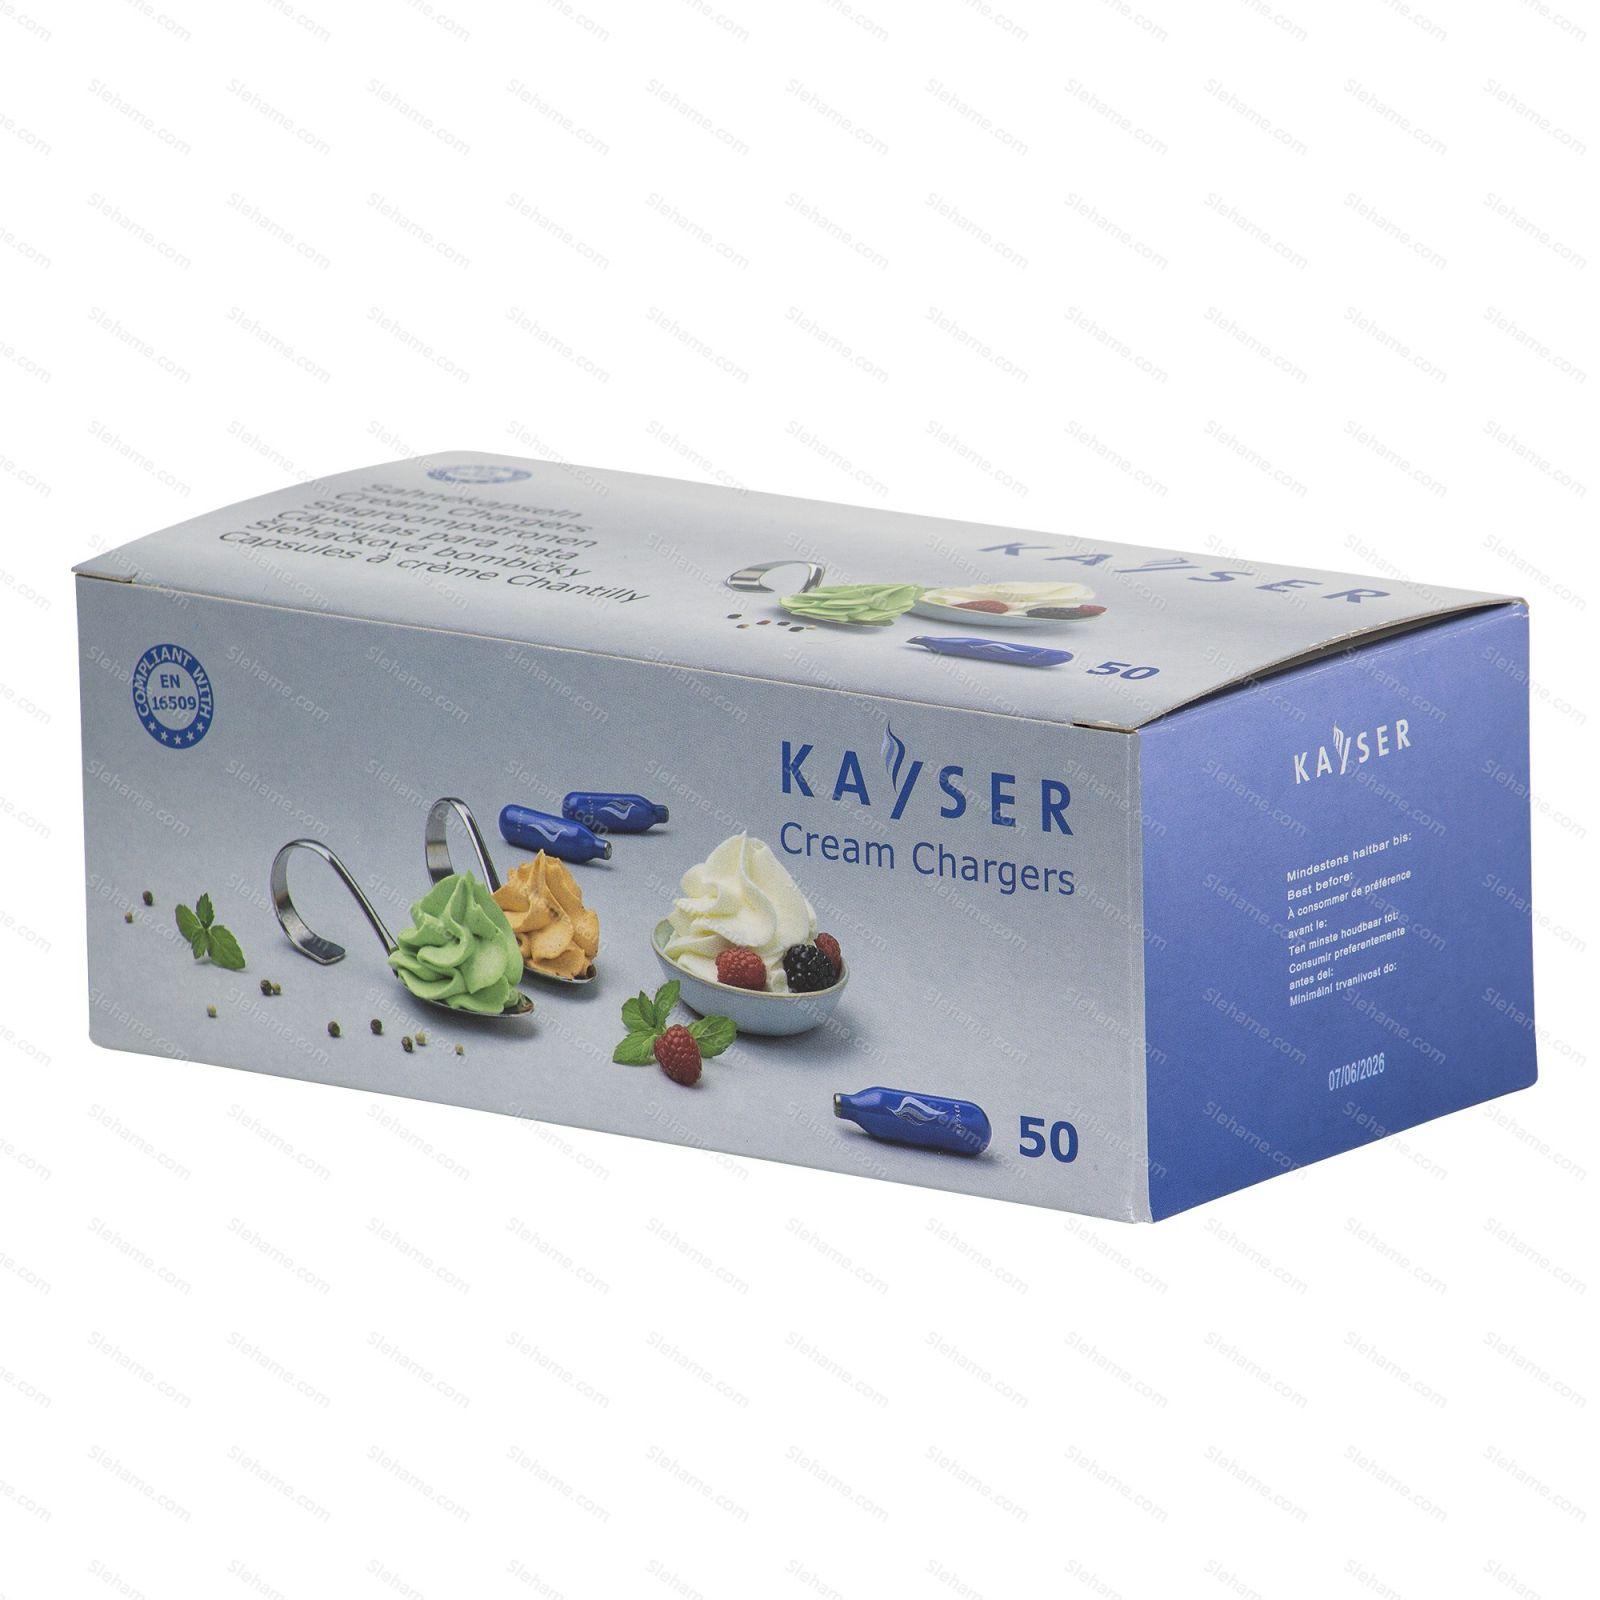 Cream chargers Kayser 7.5 g N2O, 50 pcs (disposable)